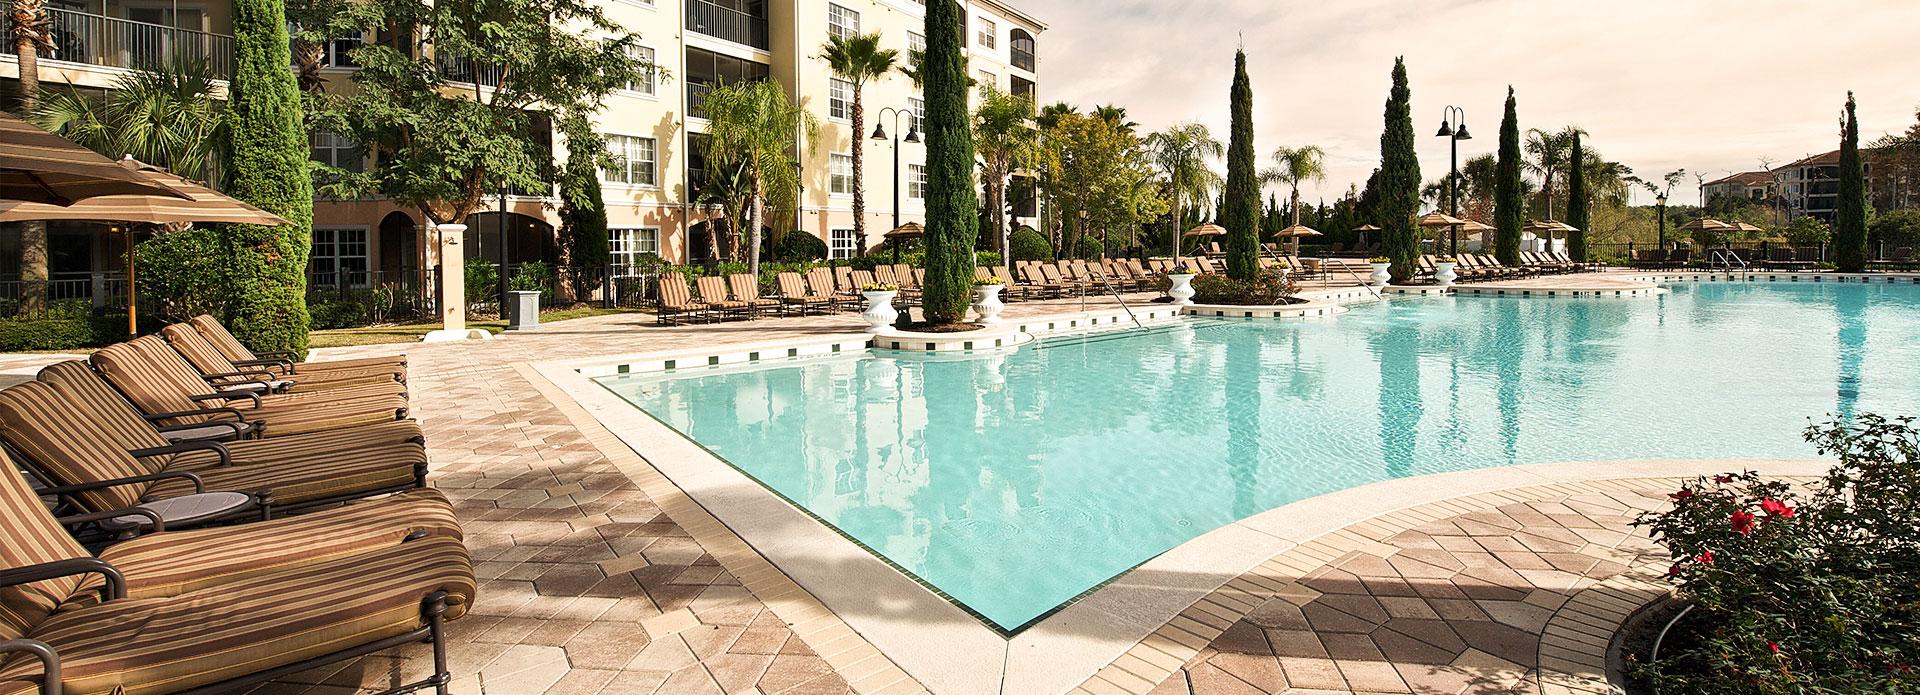 Swimming Pool of WorldQuest Orlando Resort, Orlando